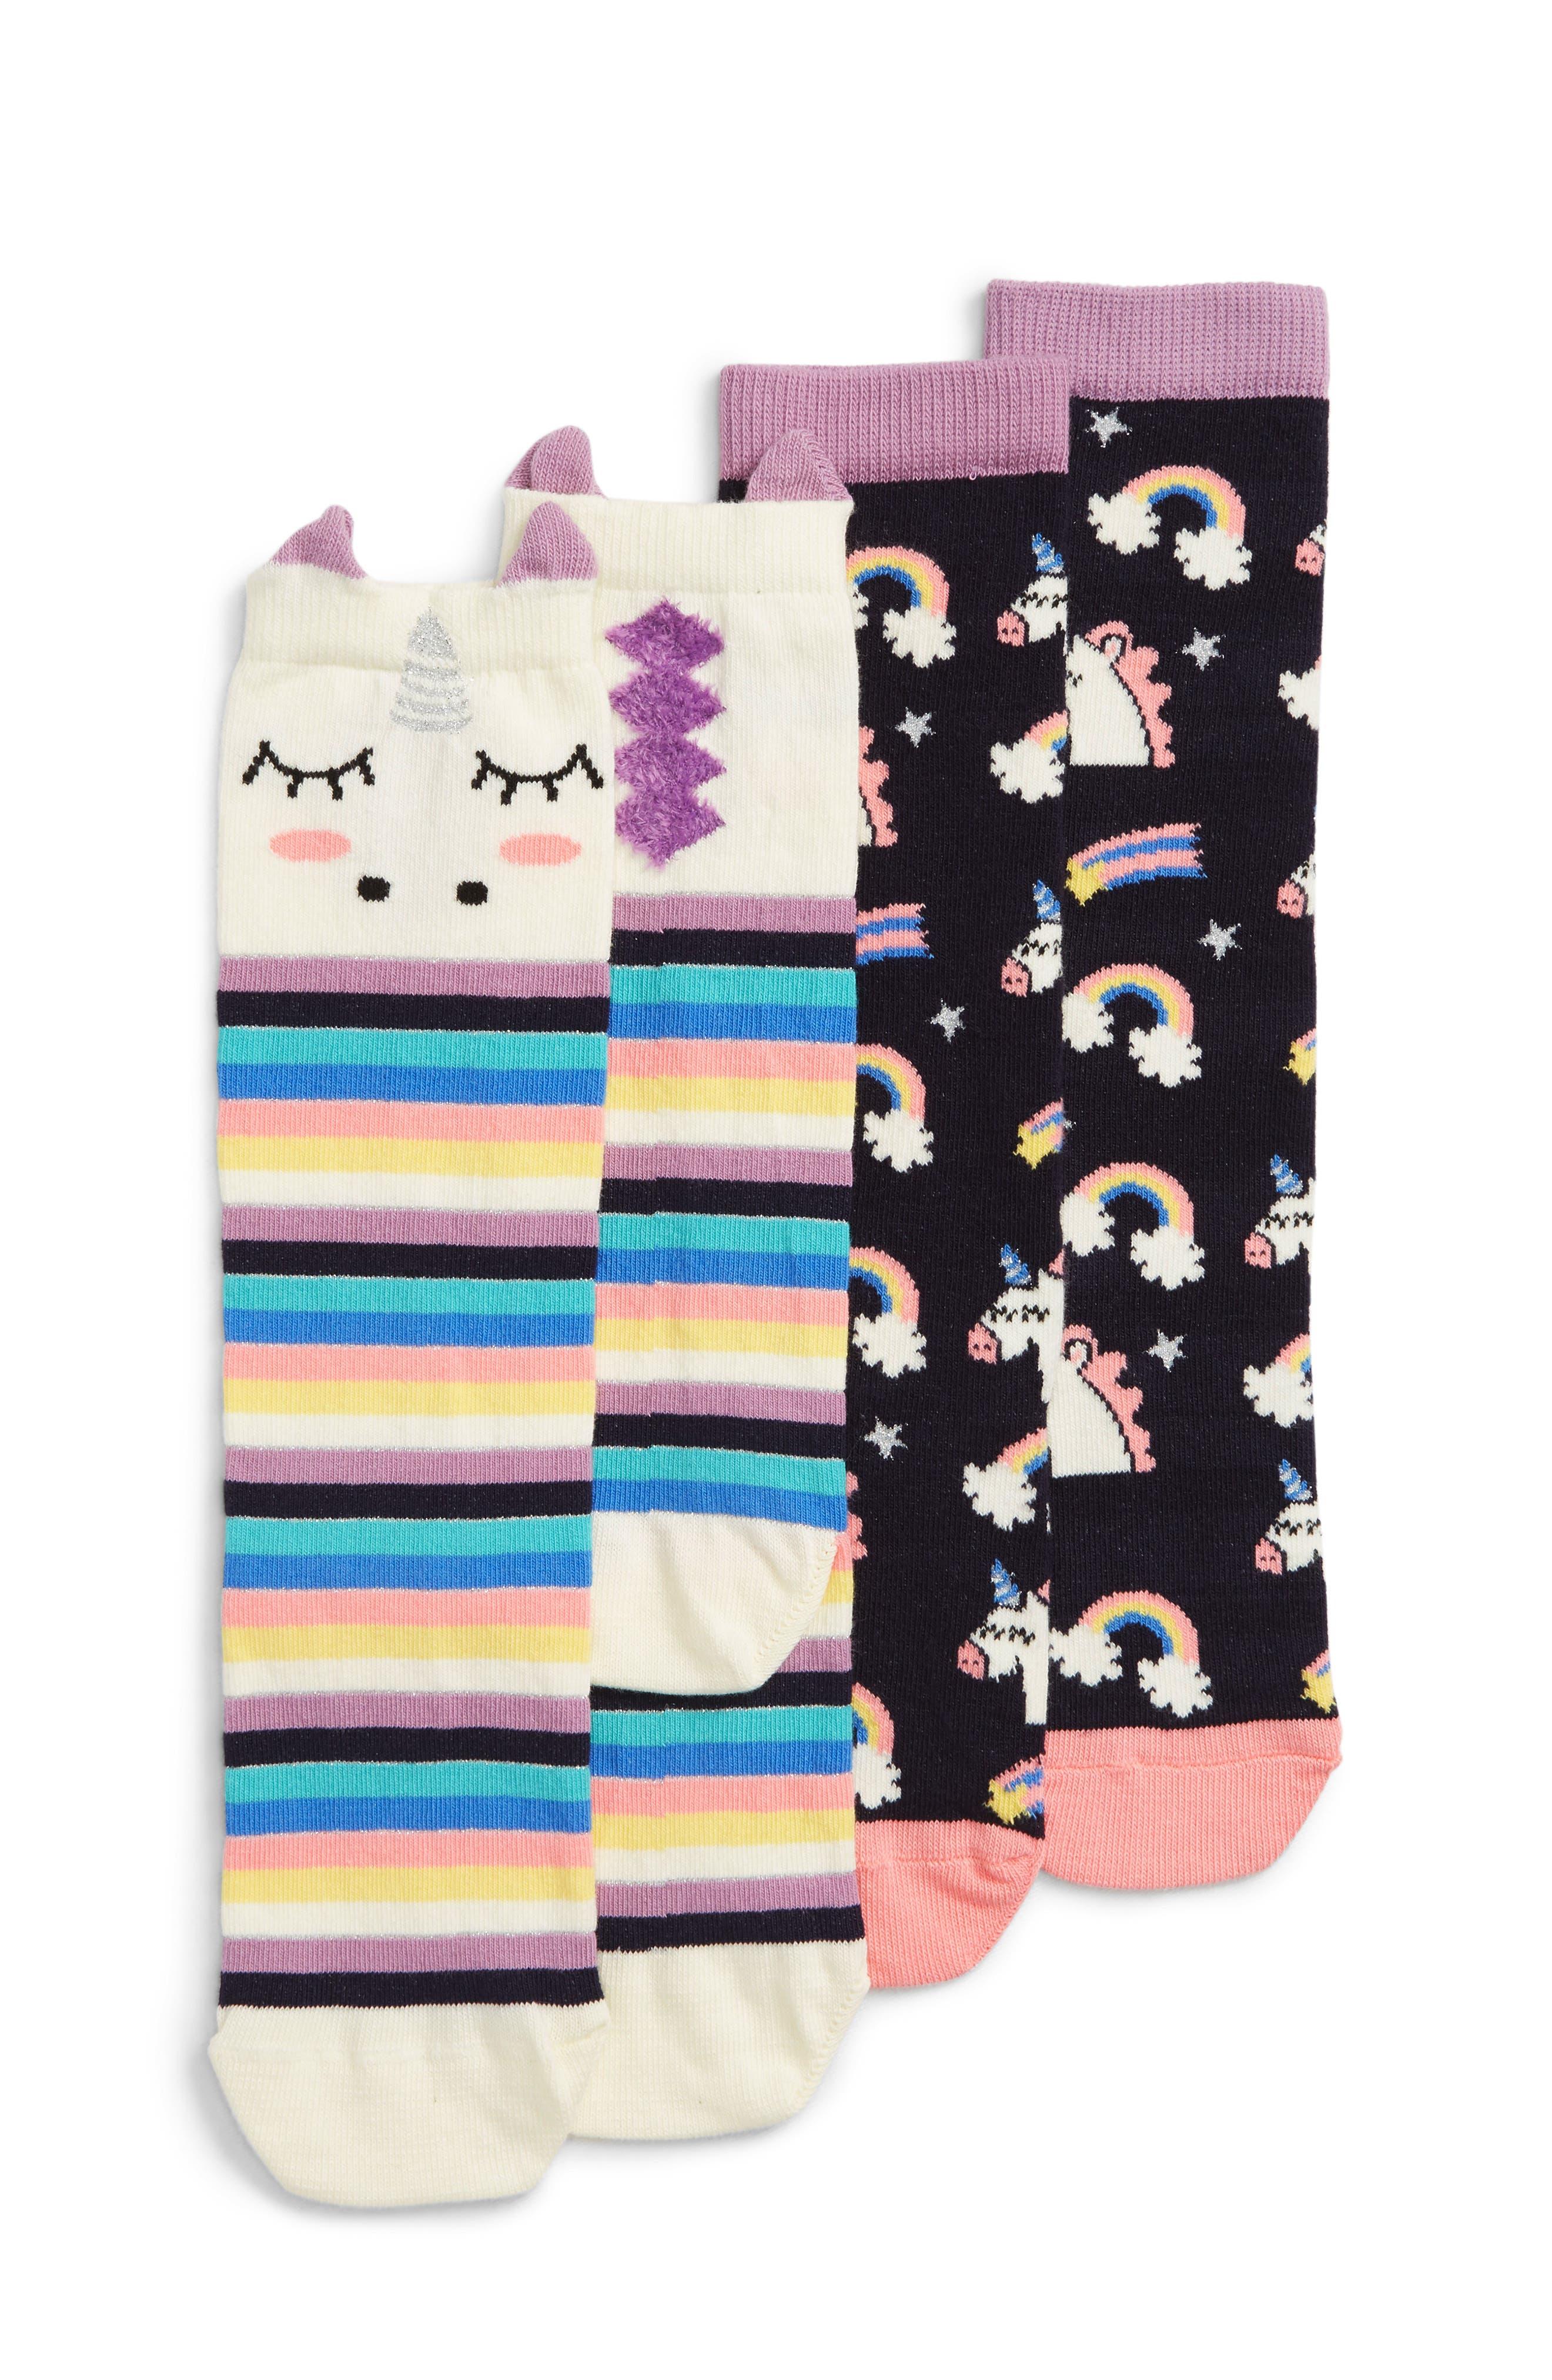 2-Pack of Rainbows & Unicorns Knee High Socks,                             Main thumbnail 1, color,                             101